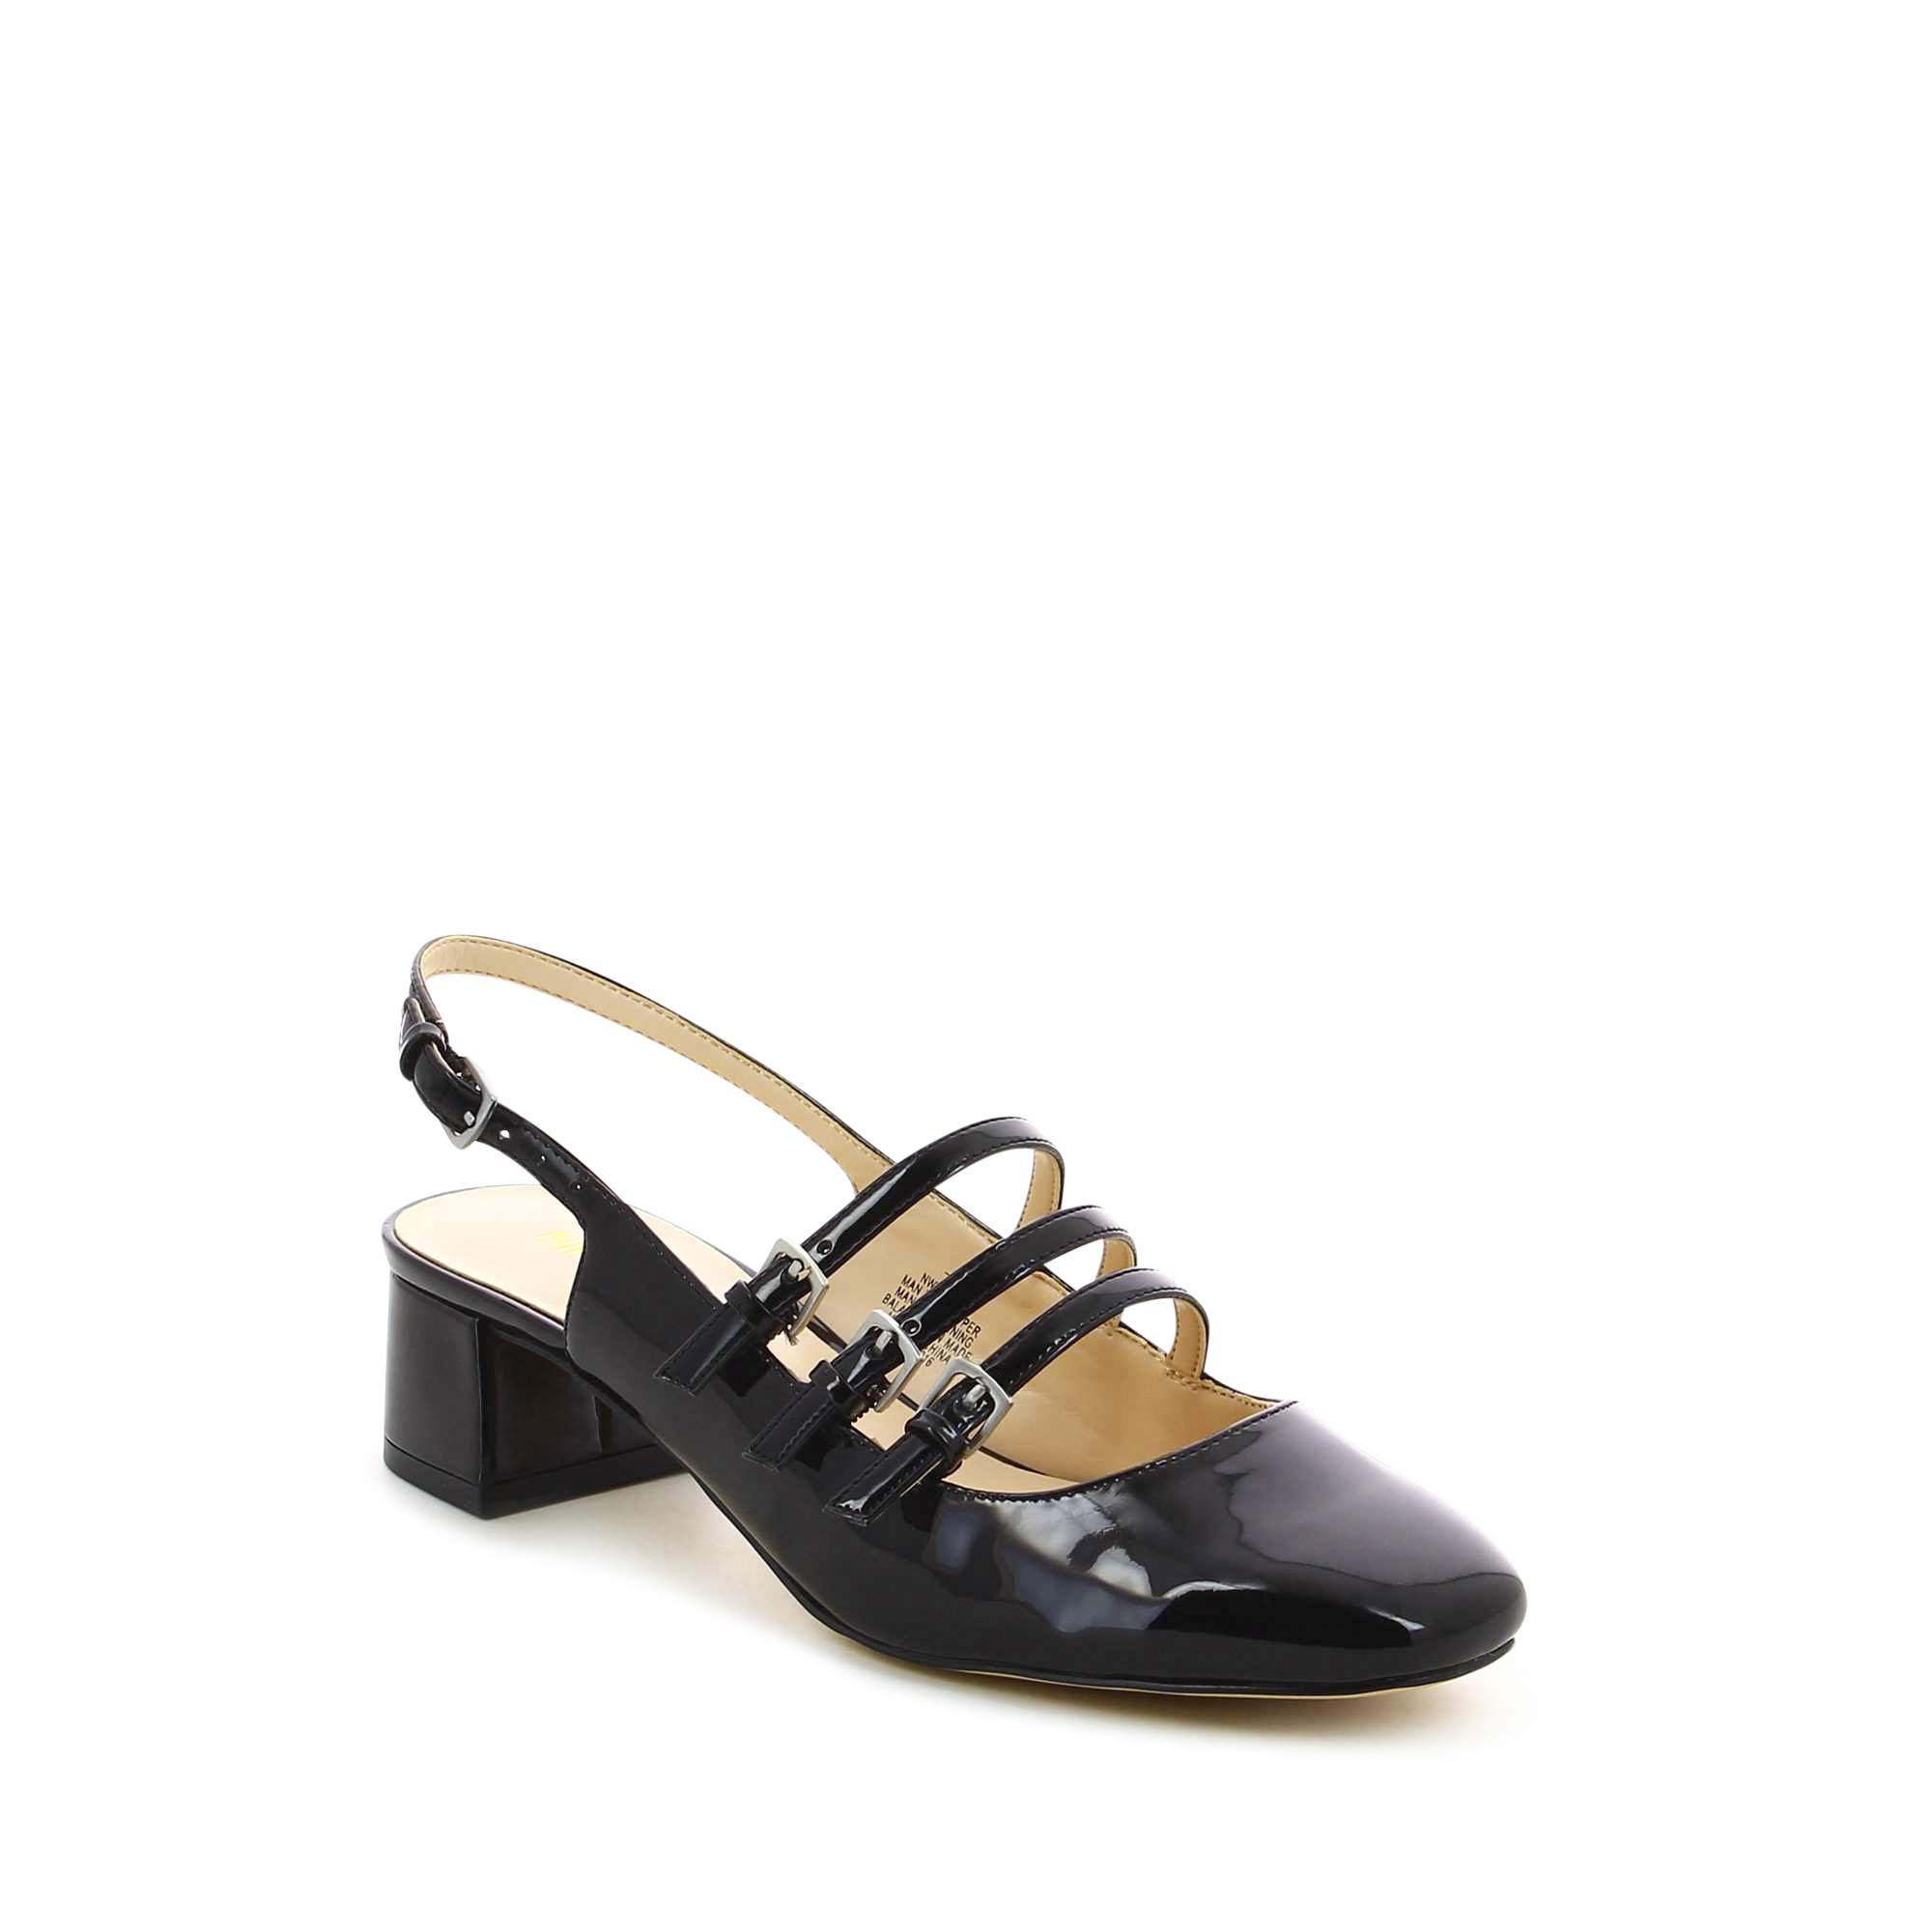 Weirley נעלי מרי גיין שחורות